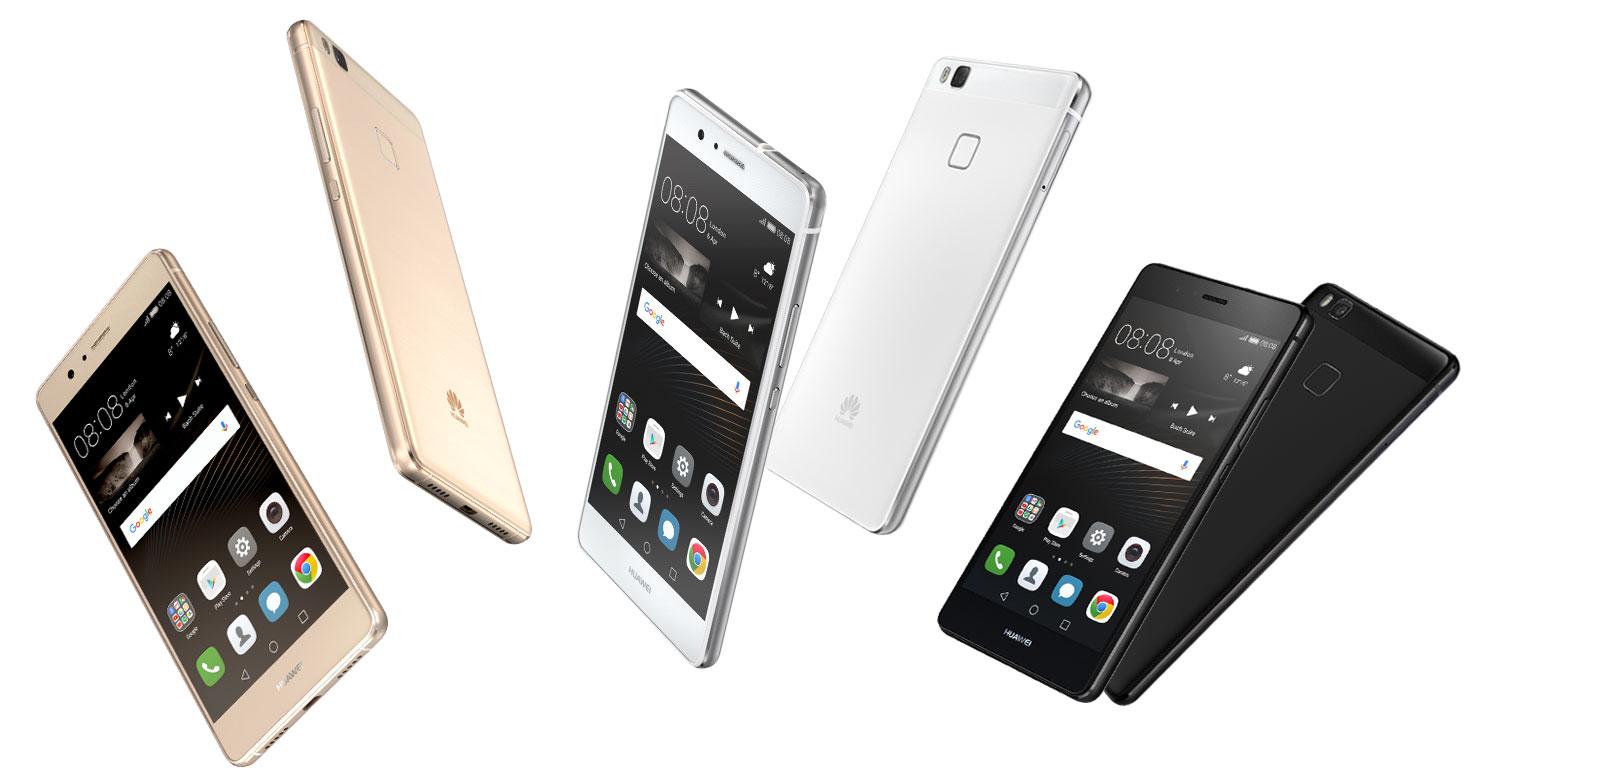 TEST: Huawei P9 Lite